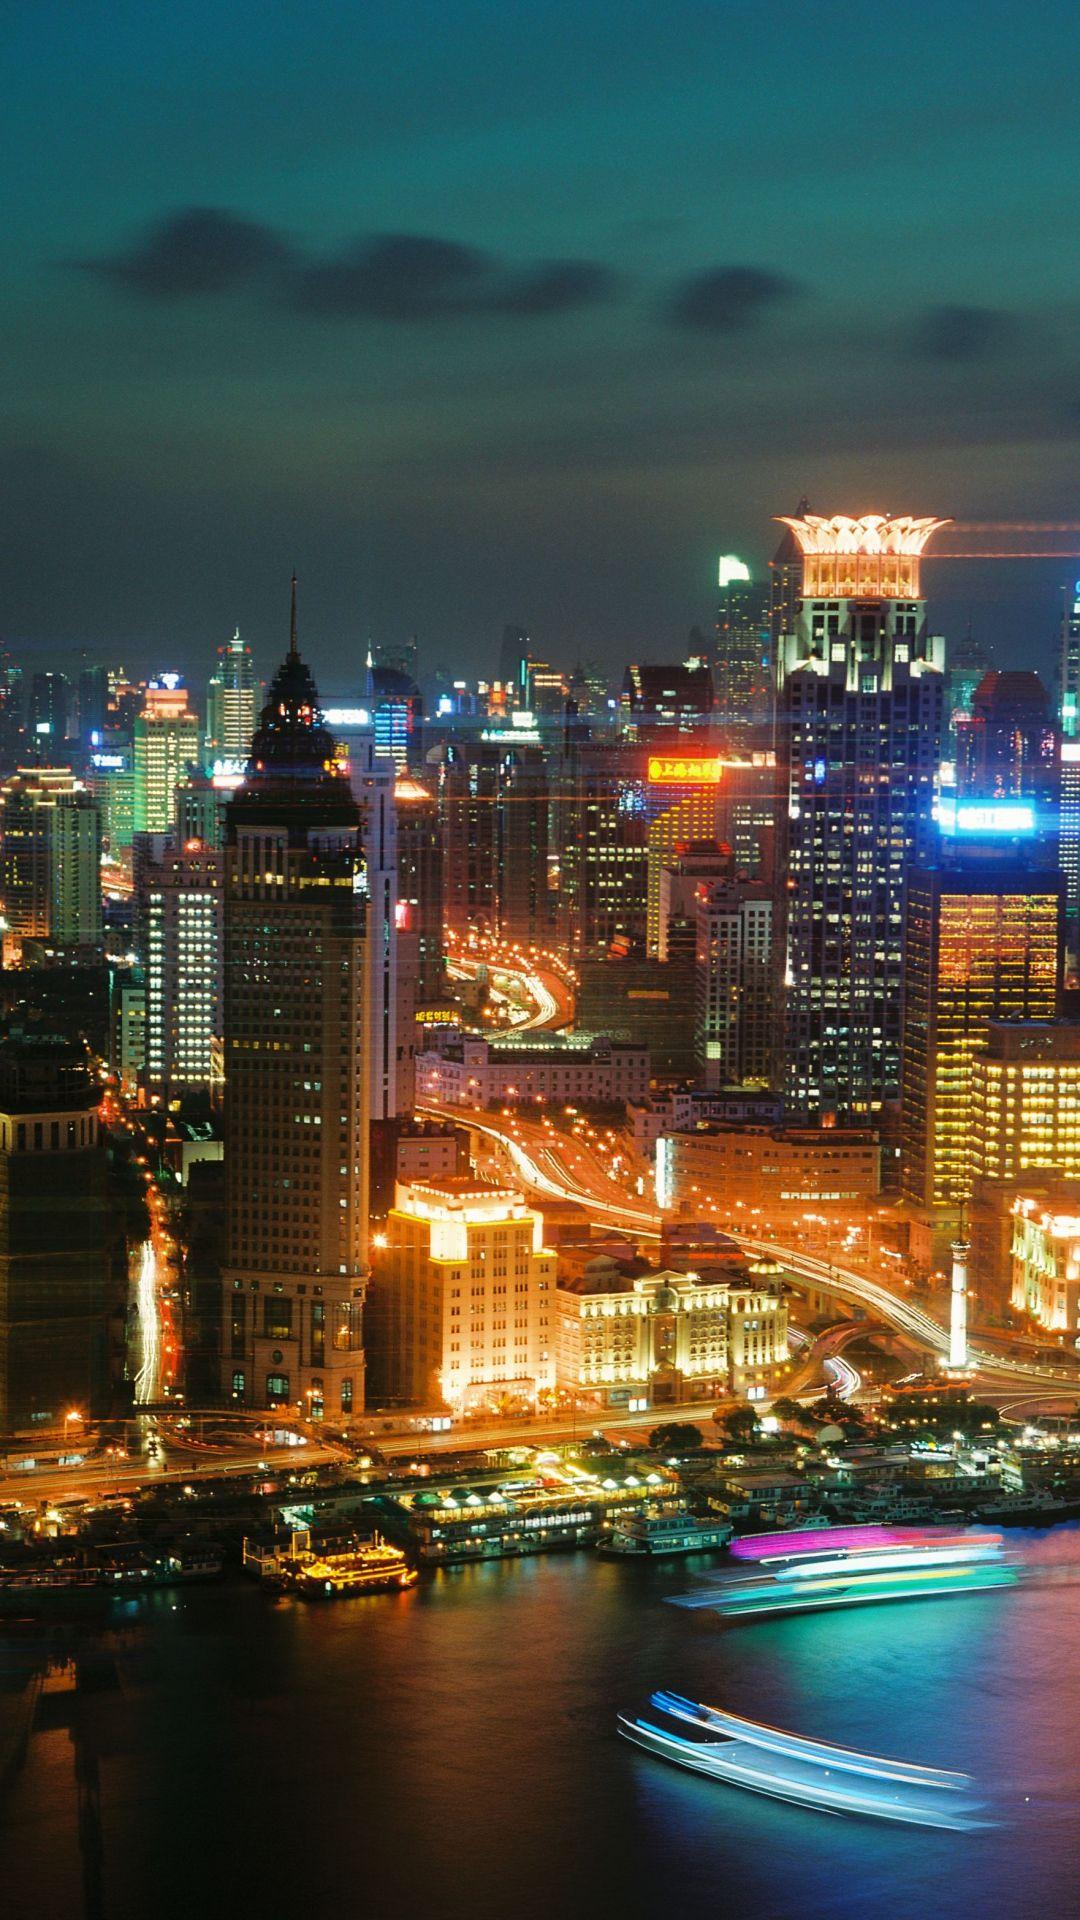 Shanghai Skyscrapers Night City Top View